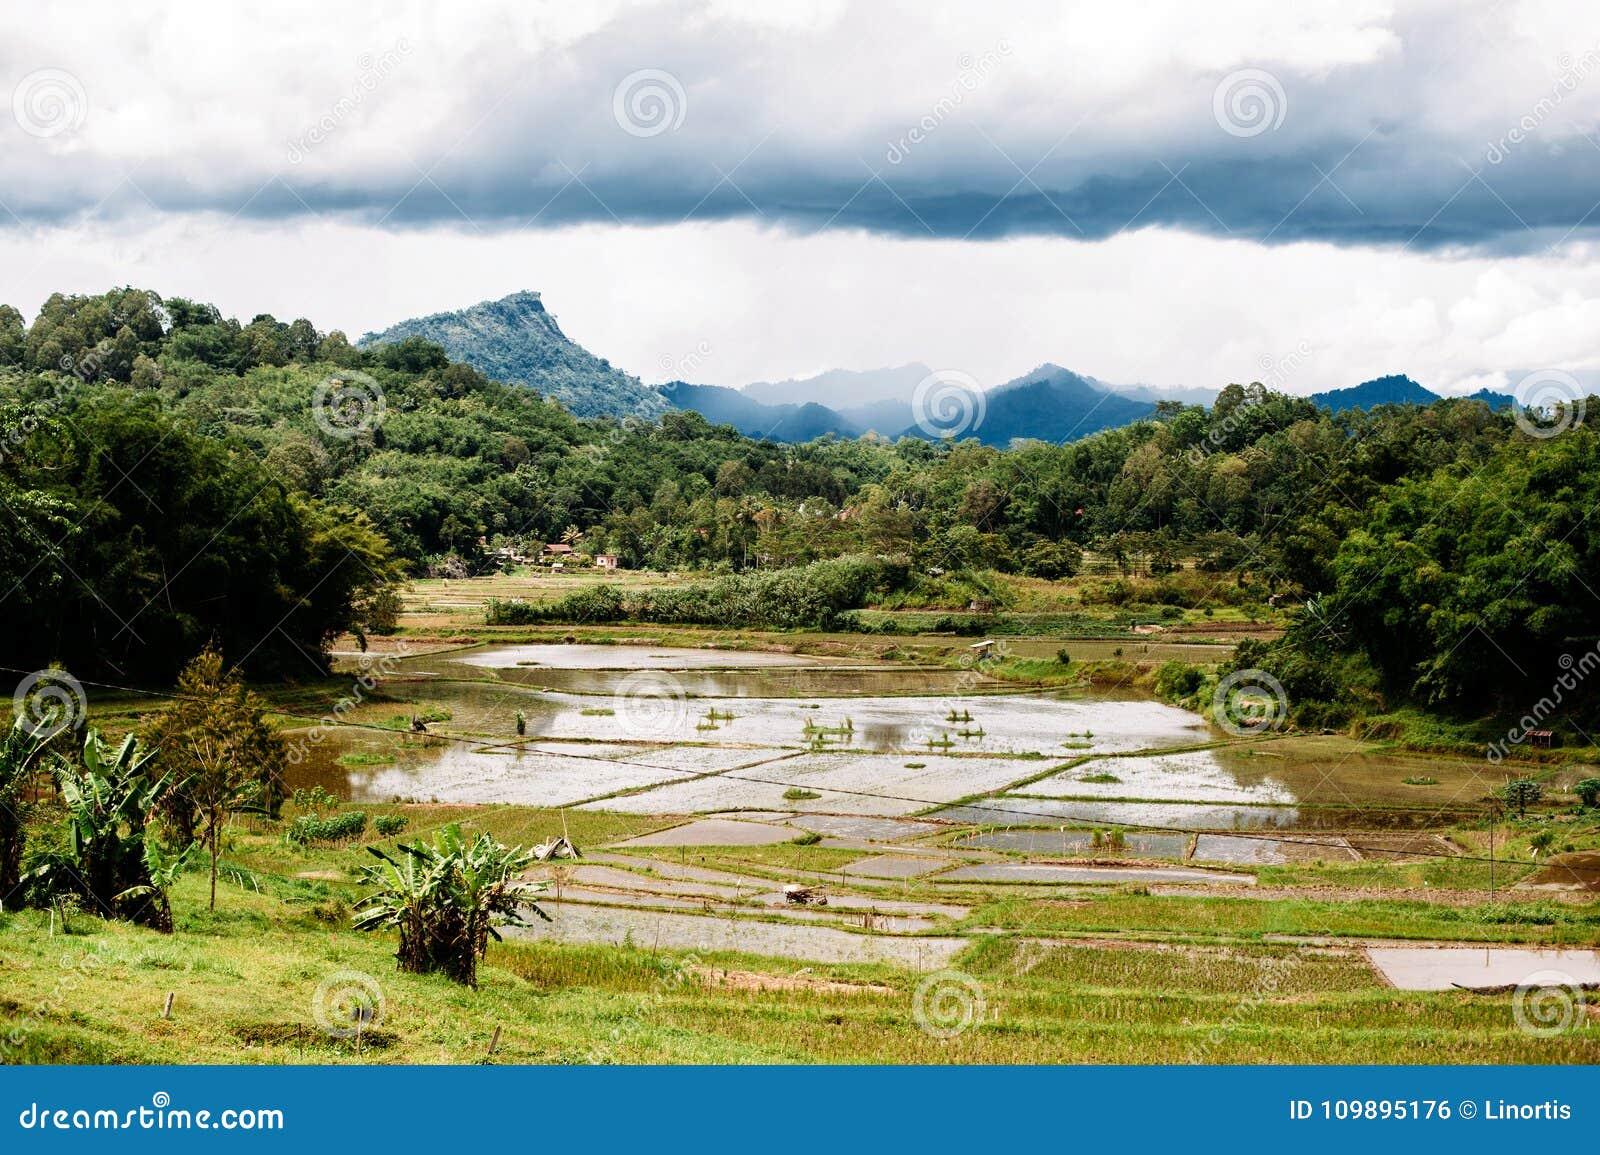 Paesaggio stupefacente di Sualwesi del sud, Rantepao, Tana Toraja, Indonesia Risaie con acqua, montagne, cielo nuvoloso